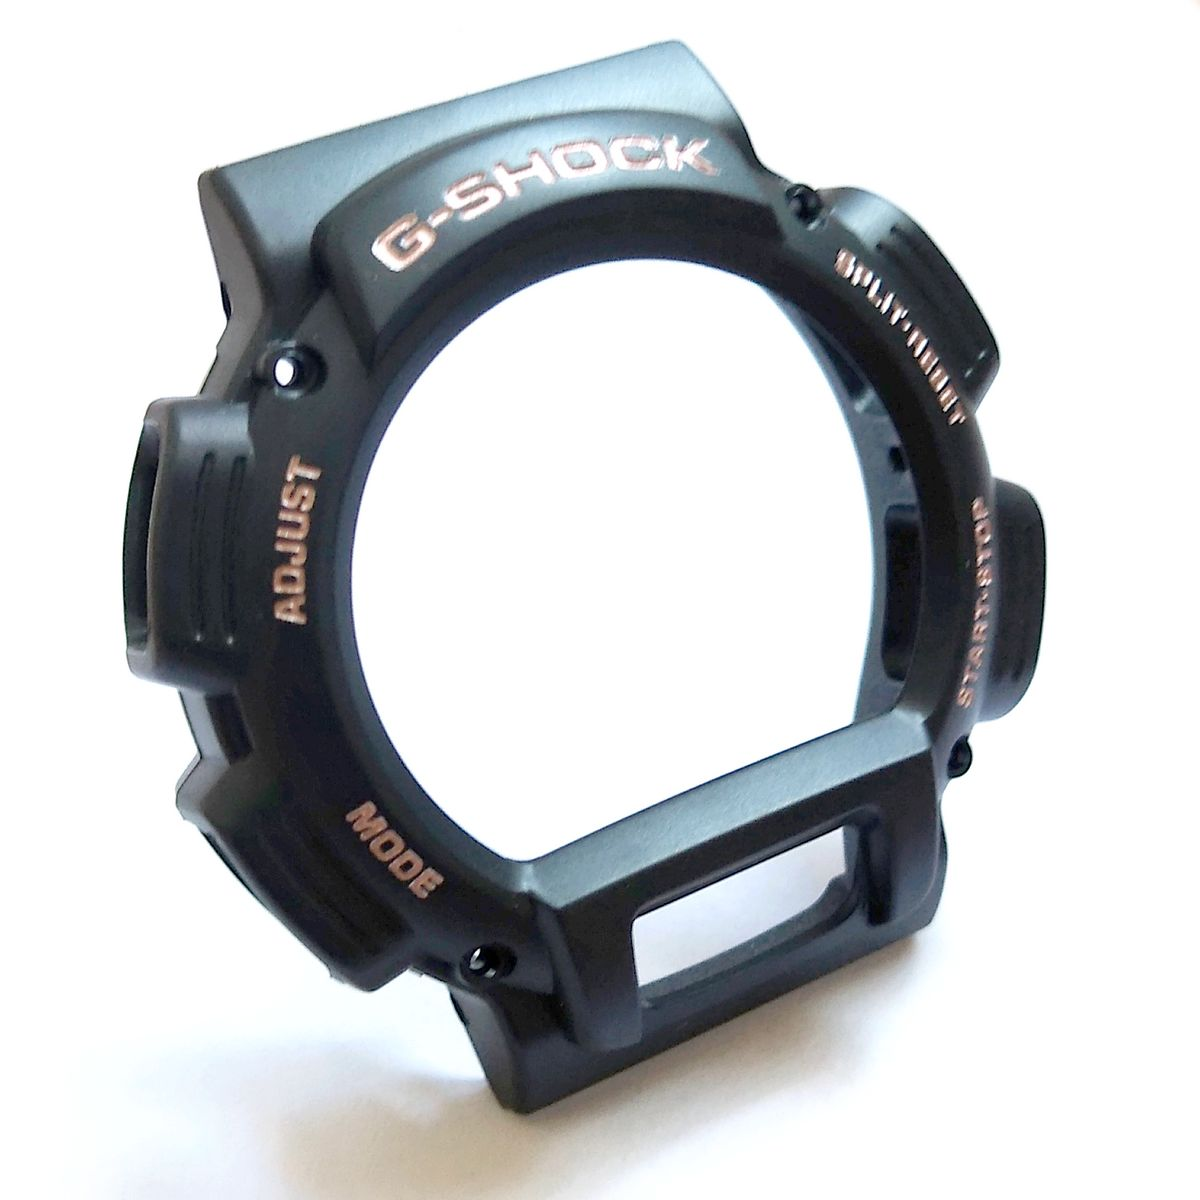 Bezel Capa Protetora Casio Gshock DW-9052GBX-1A4  - E-Presentes